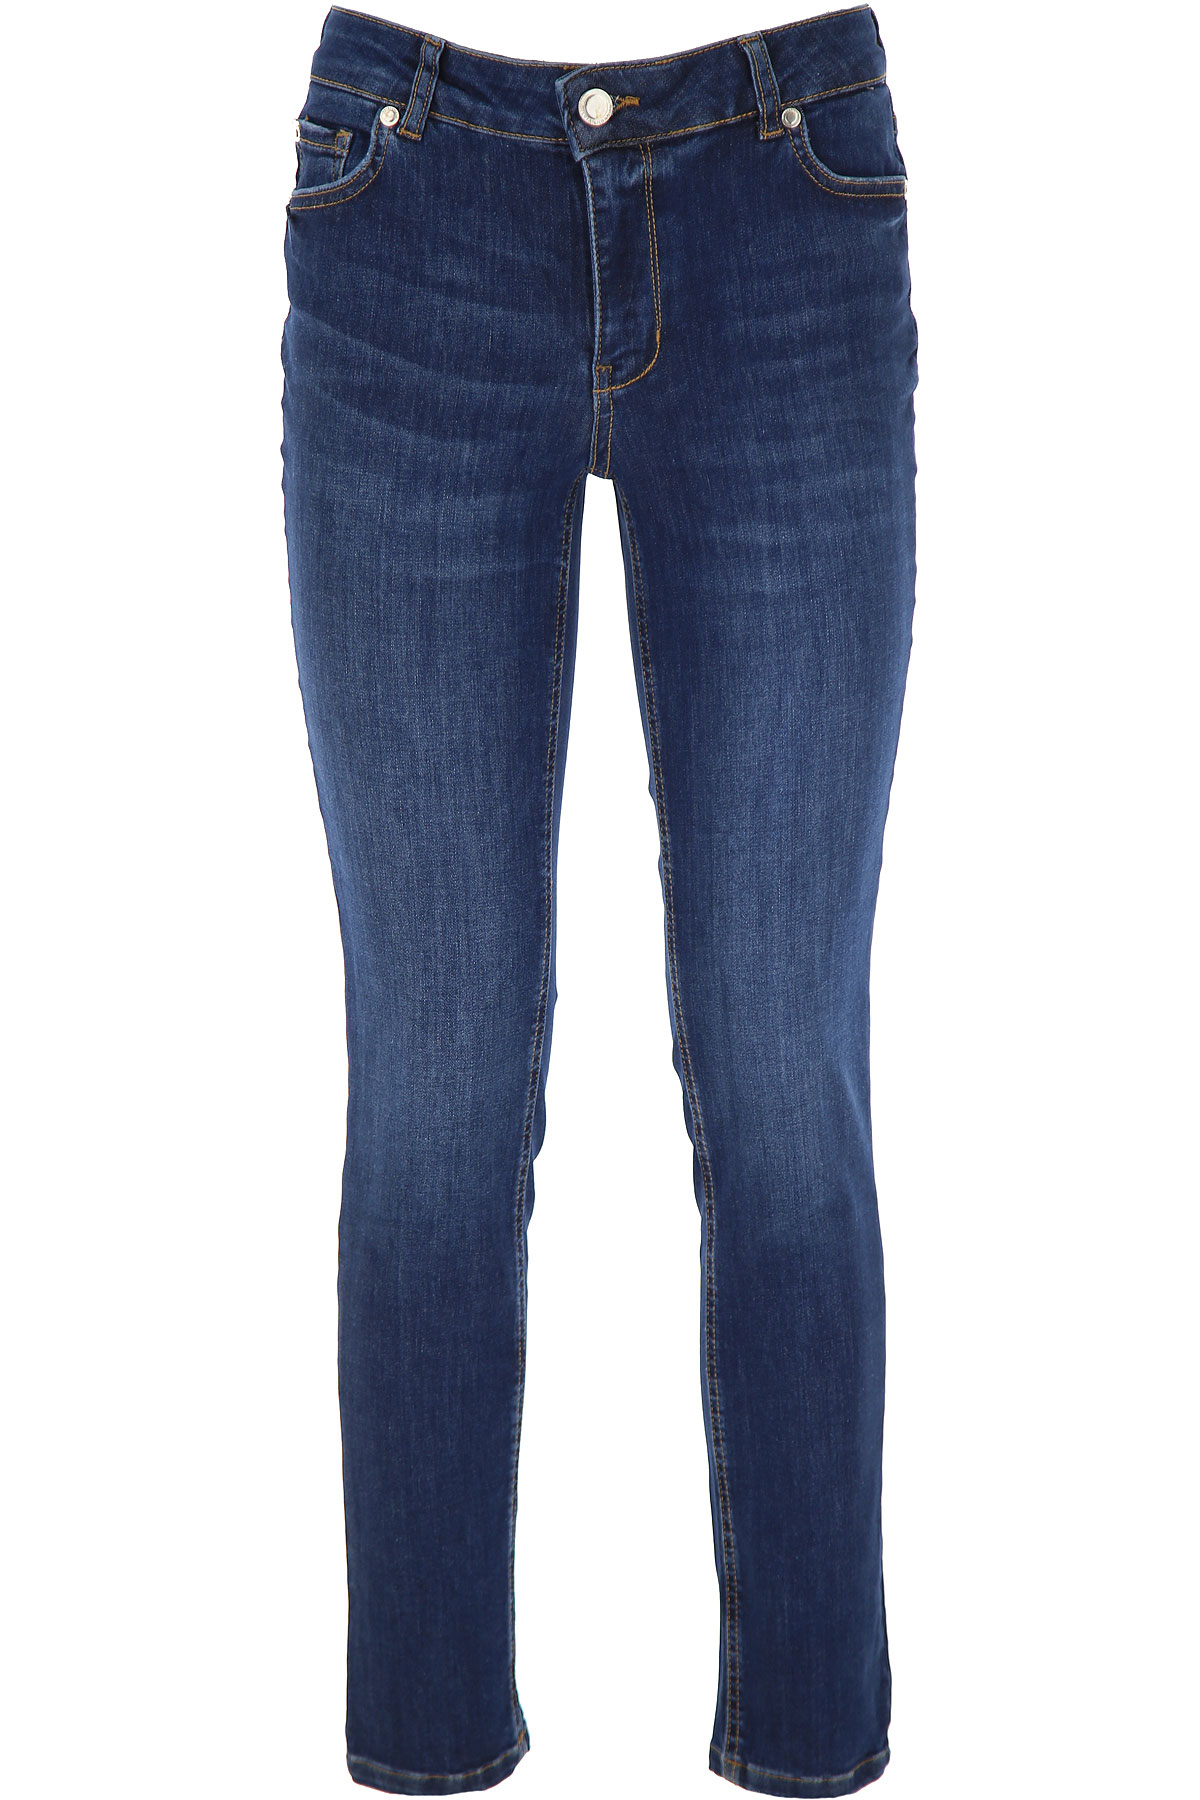 Silvian Heach Jeans On Sale, Denim Blue, Cotton, 2019, 25 27 30